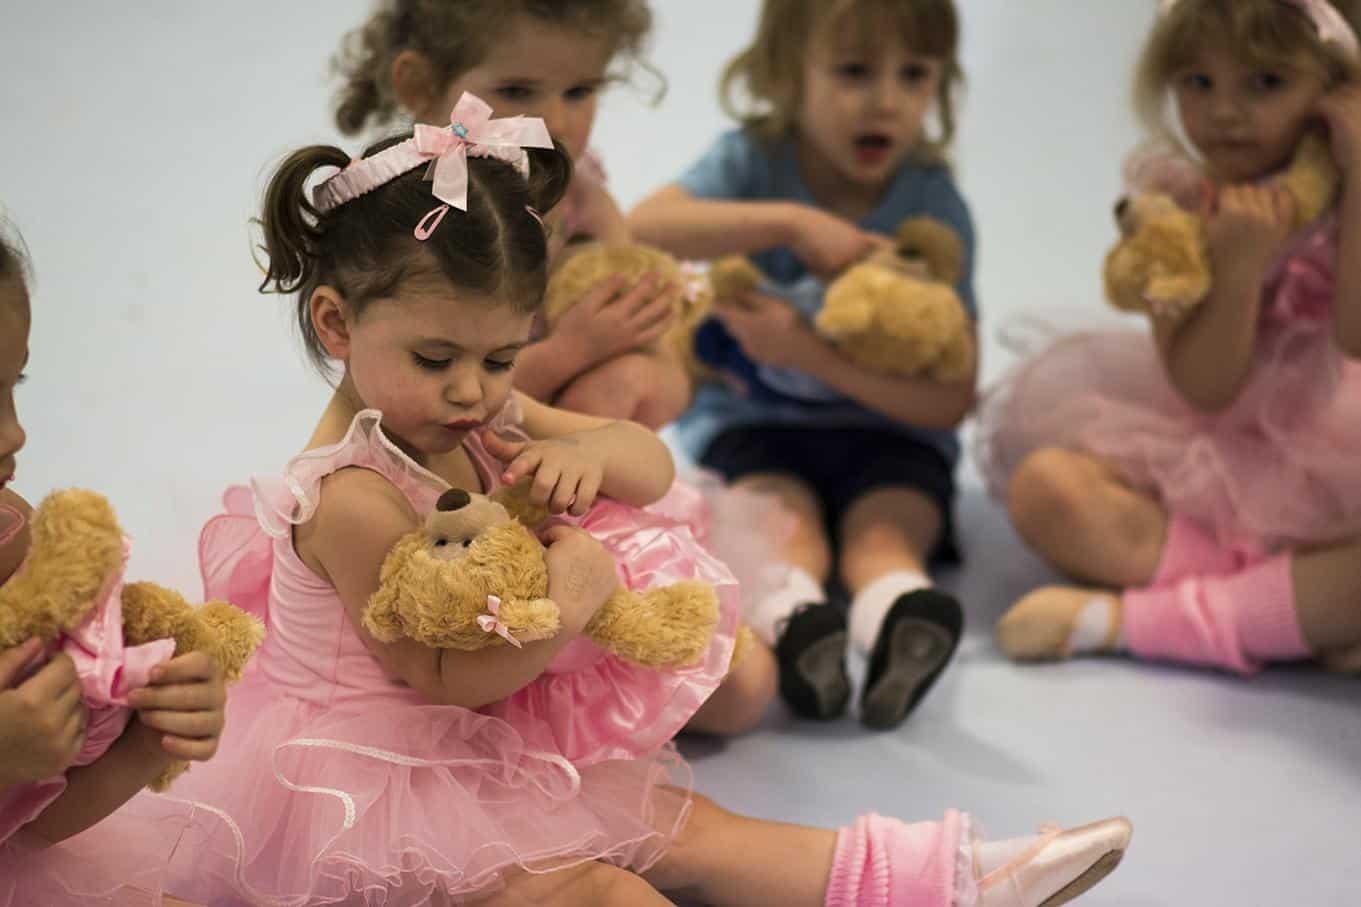 Children S Dance Classes Australia New Zealand